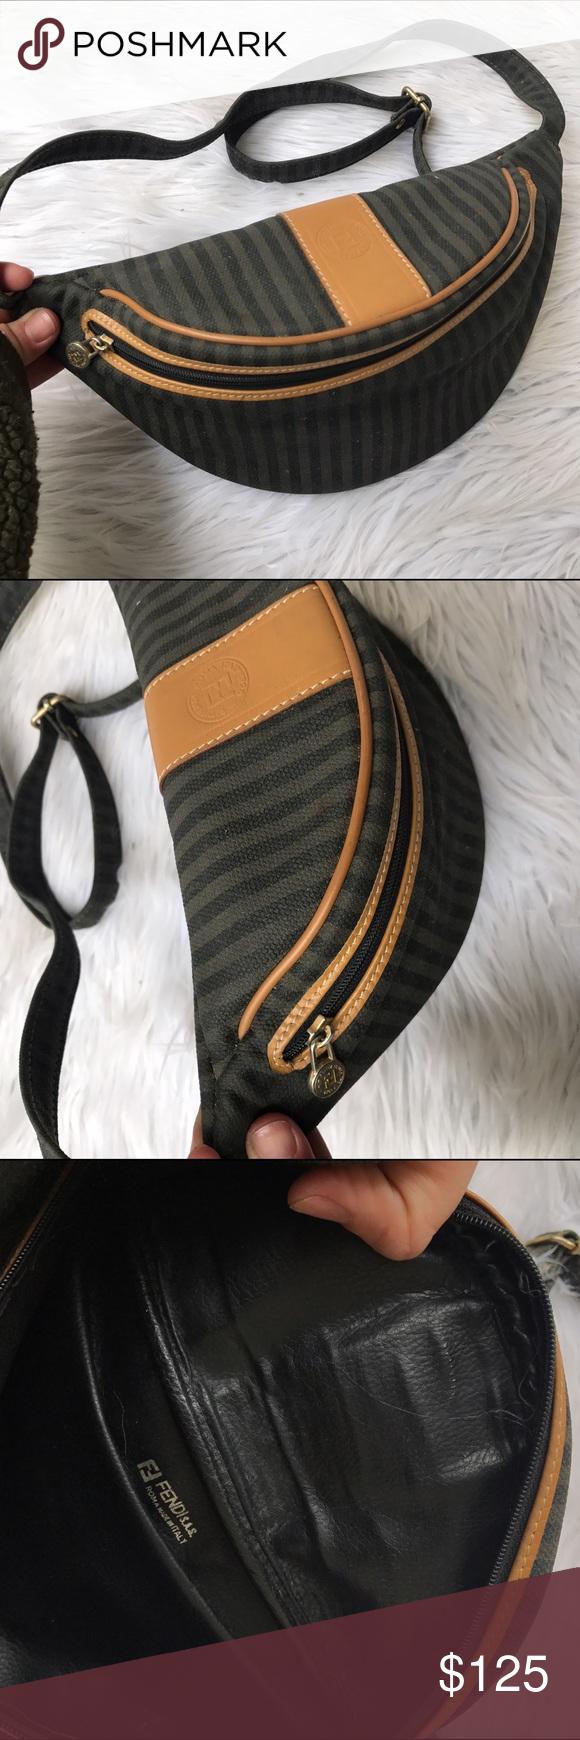 f970cfb5772f FENDI LEATHER FANNY PACK BAG AUTHENTIC BAG Super cute vintage GUCCI fanny  pack ✨ Fendi Bags